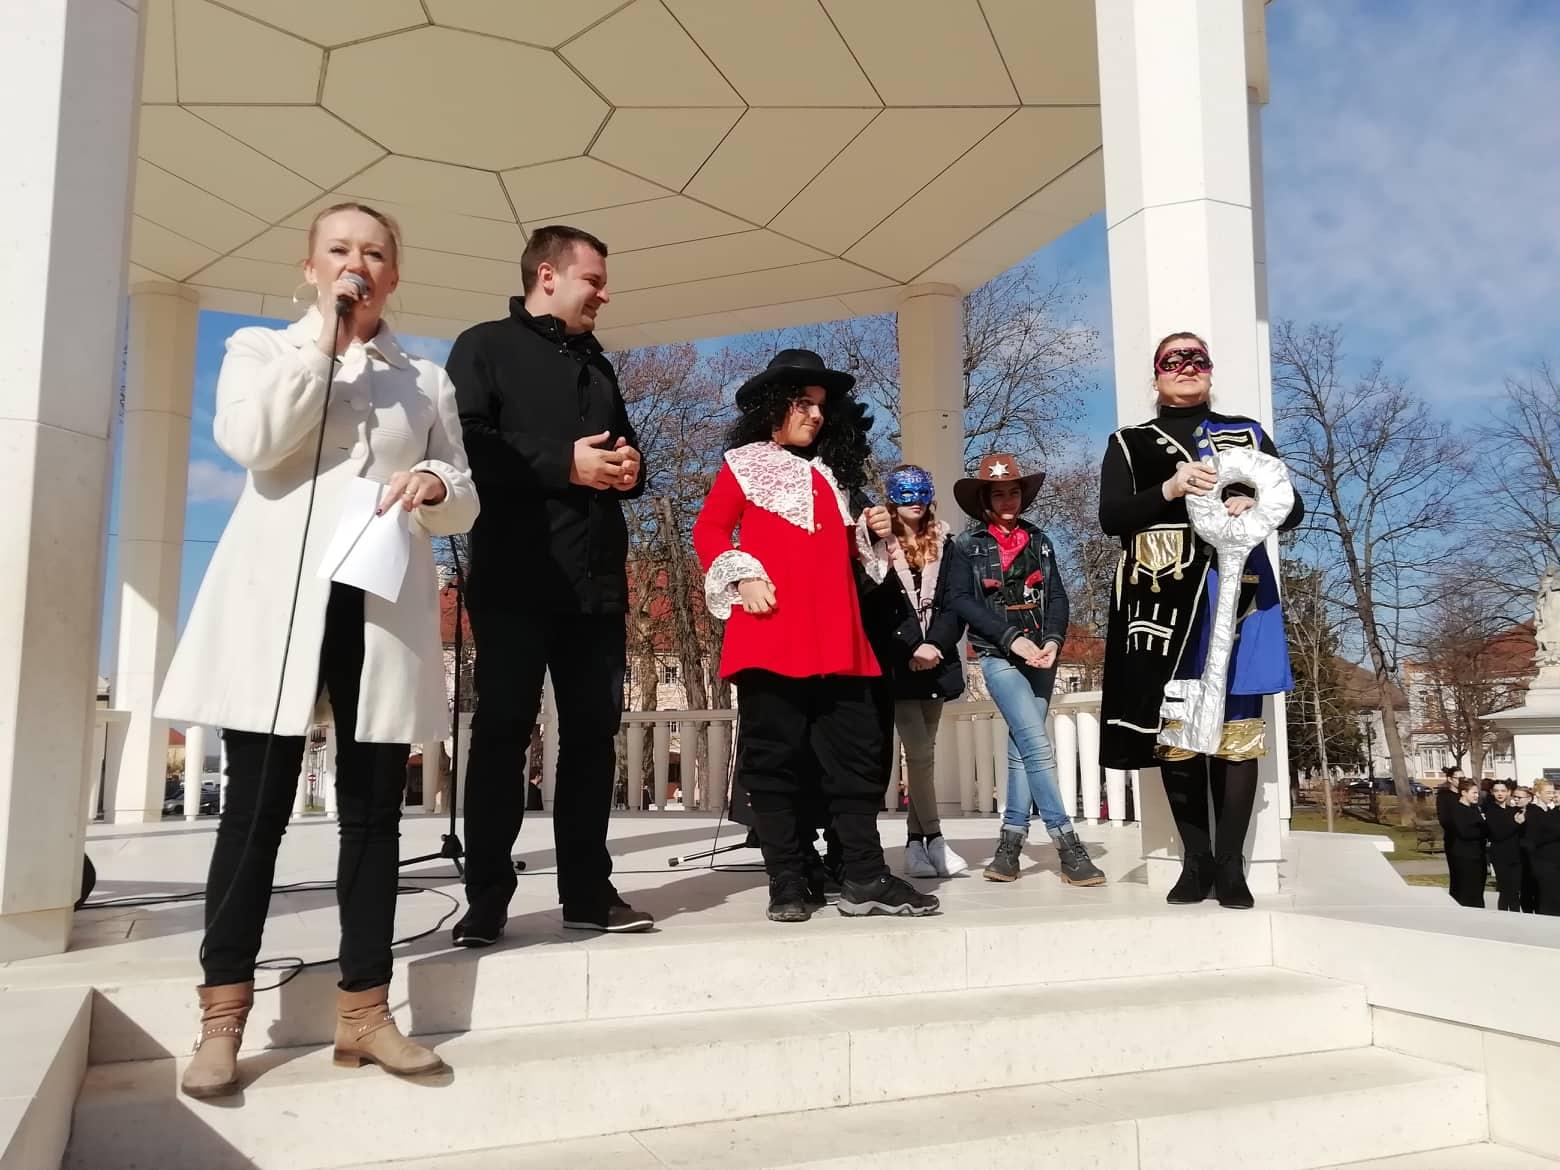 HREBAK PAO S VLASTI Novi gradski vlastodršci najavili drastične reforme!